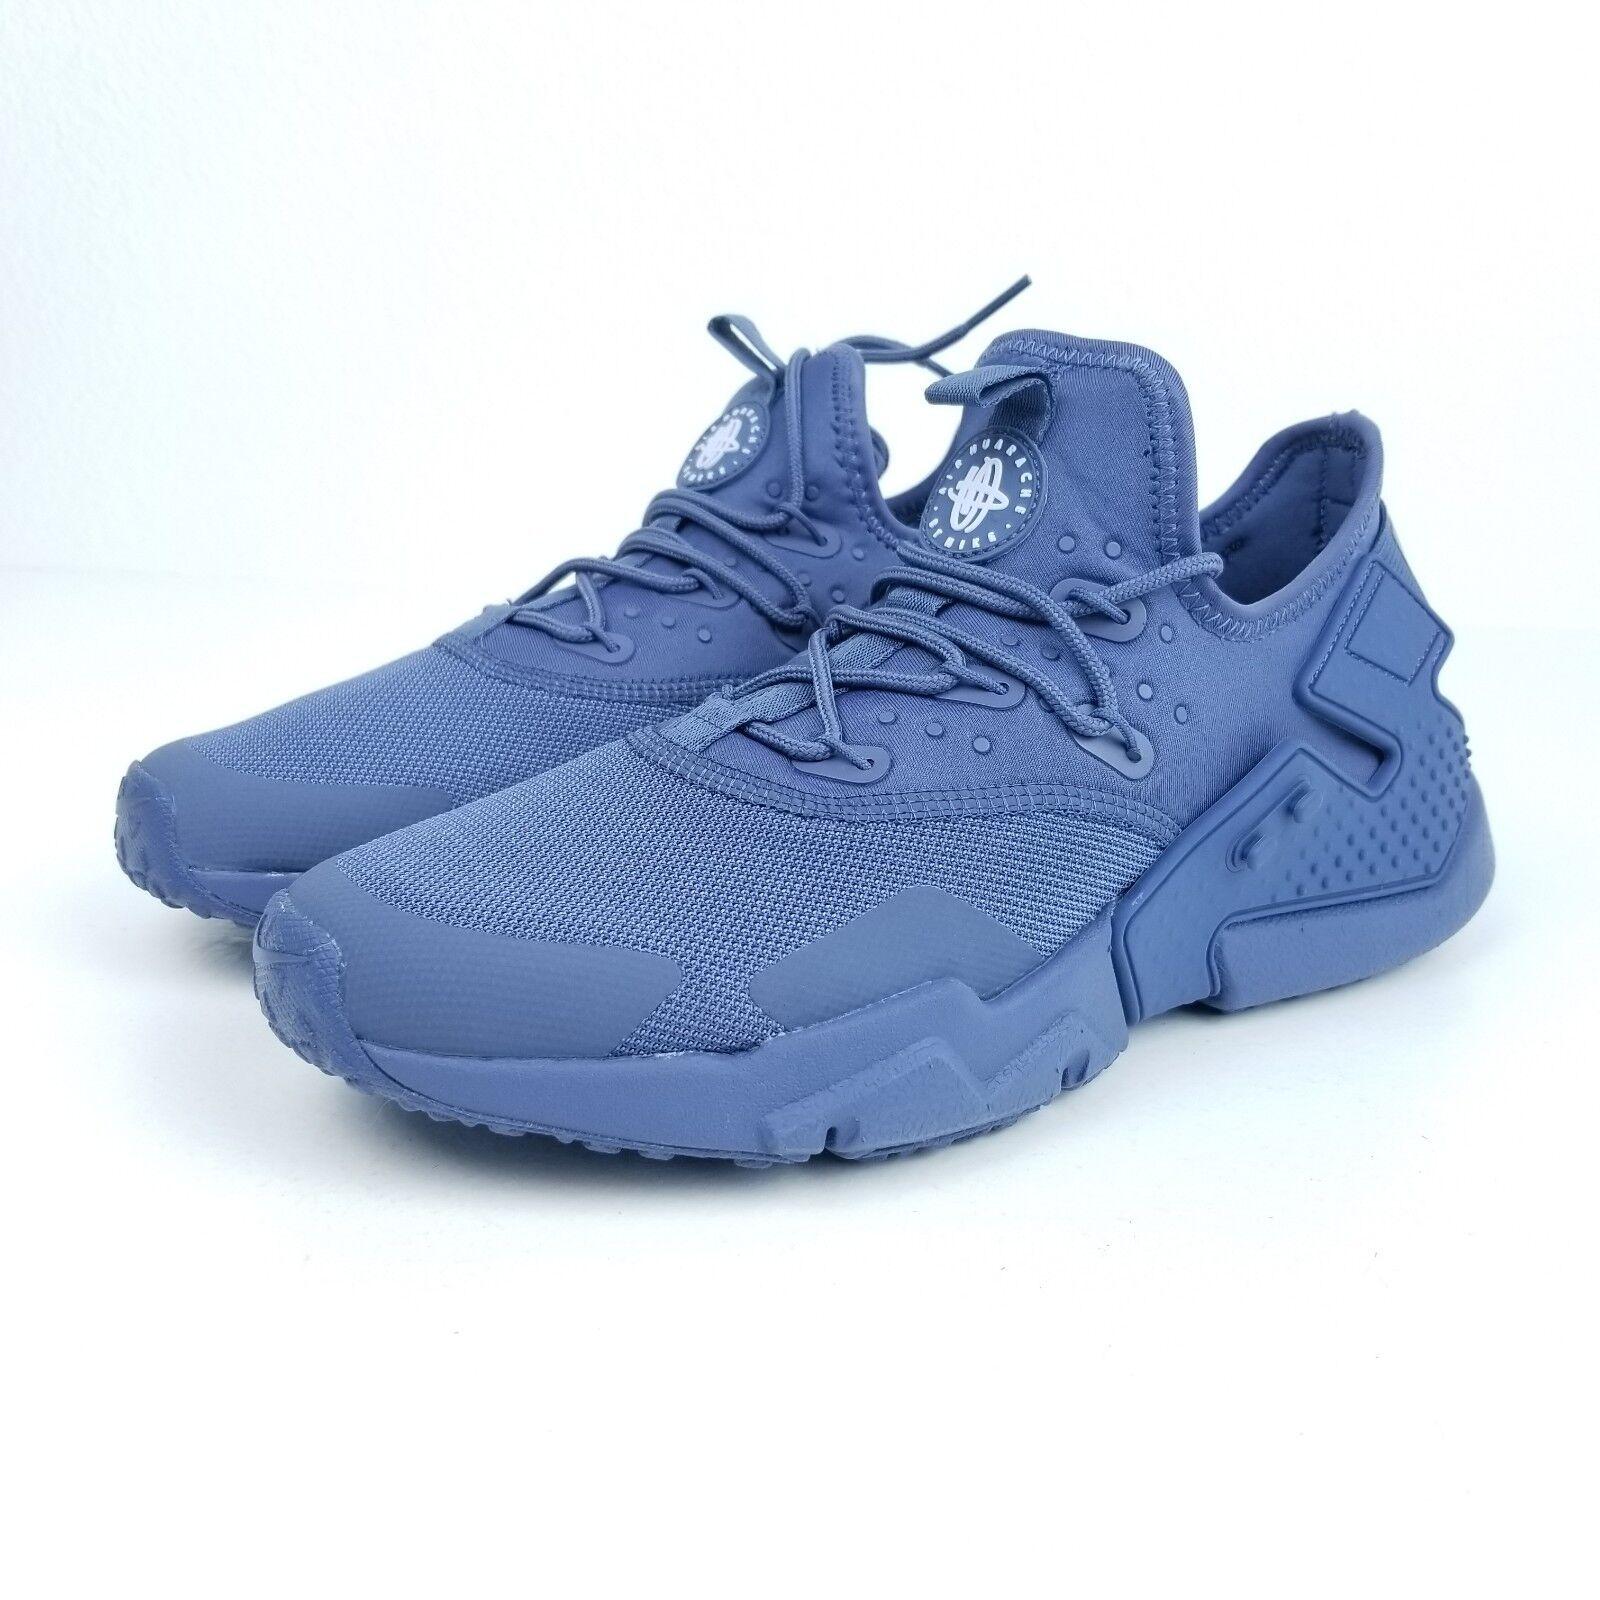 NIKE Blue Air Huarache Drift Mens Shoes Multi Size Diffused Blue NIKE AH7334 400 afa99c